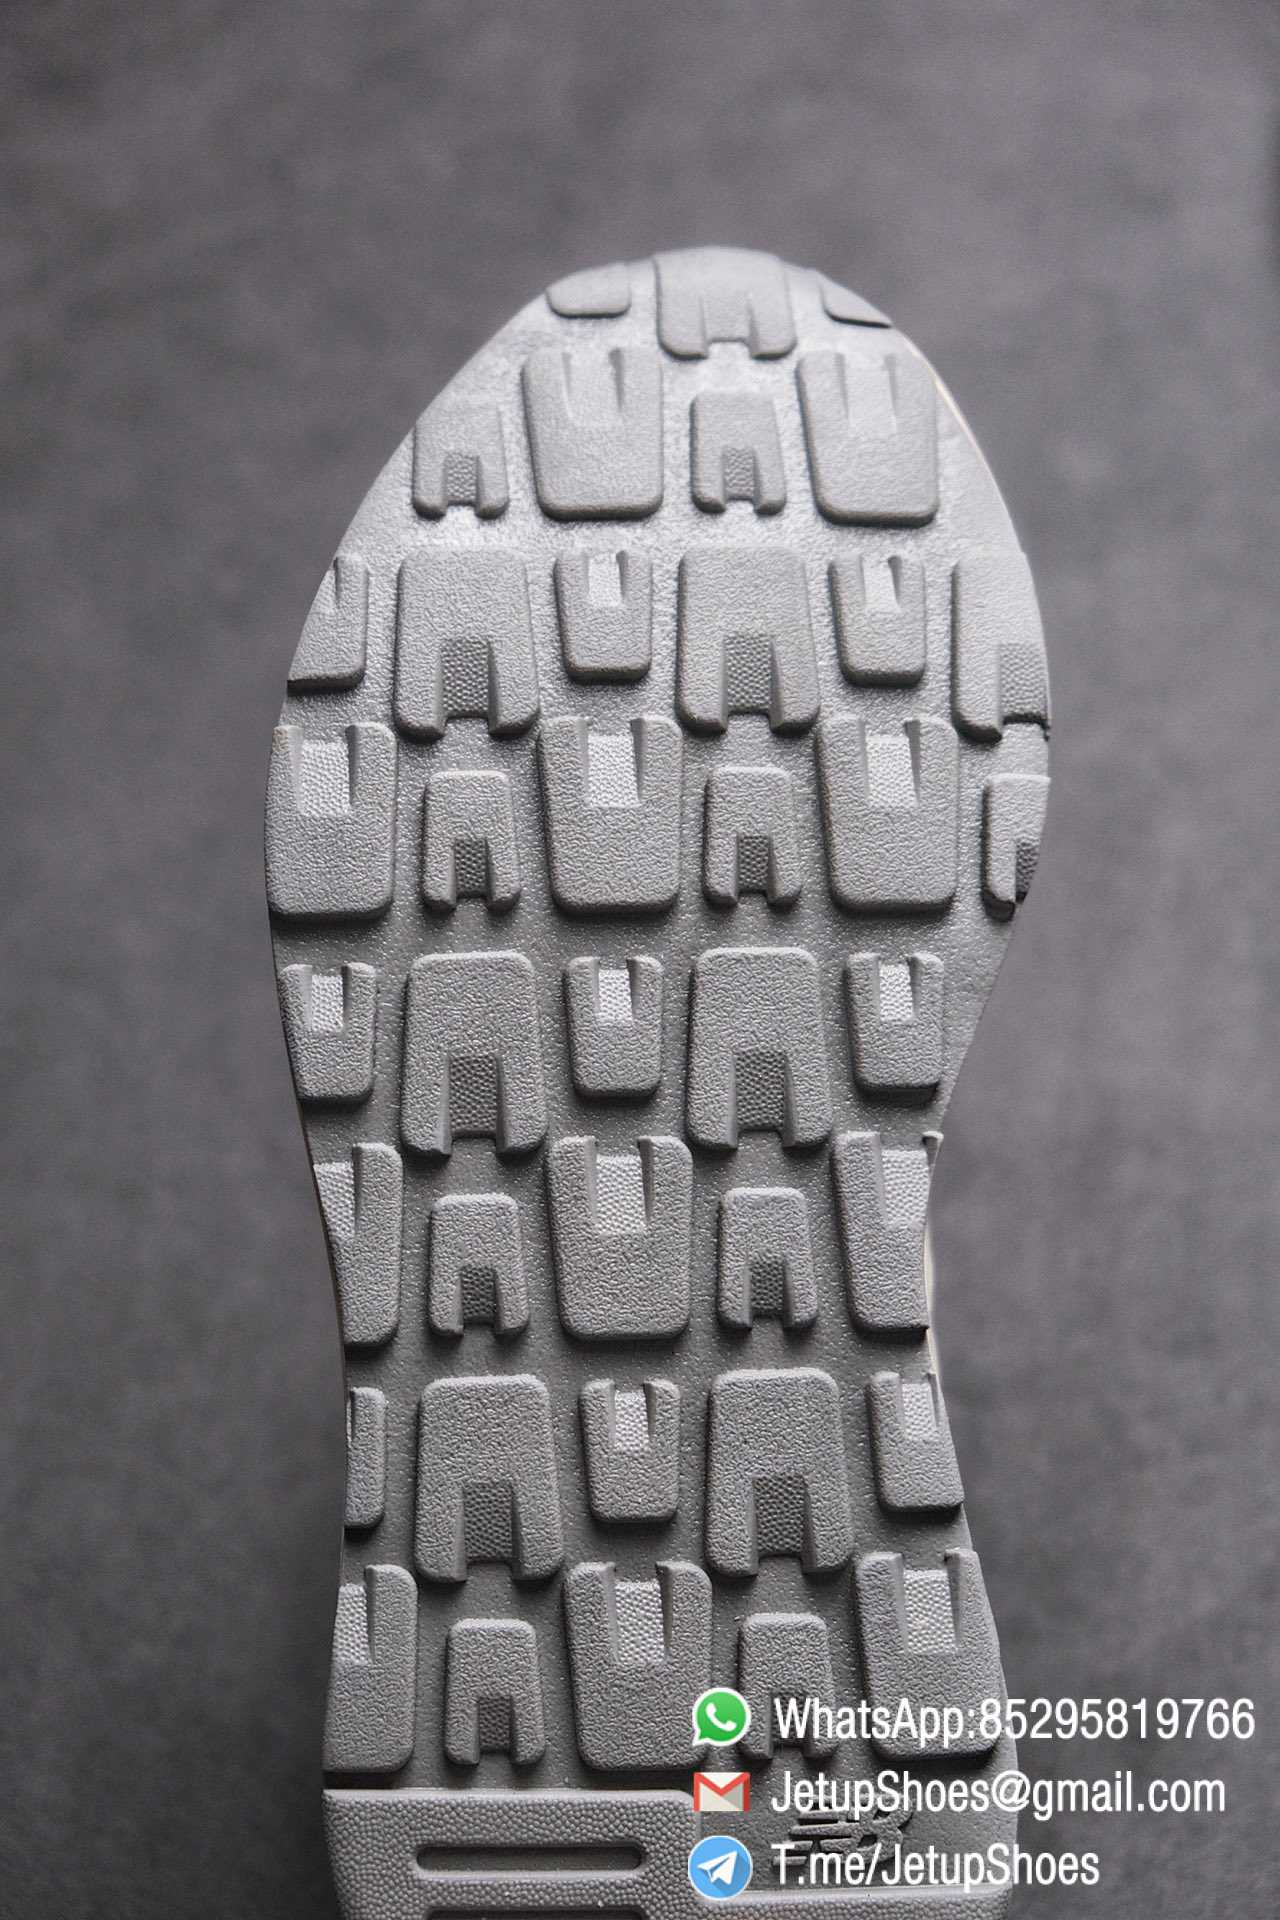 Best Replica New Balance 5740 Beige Cream SKU W5740CE Mesh Shell Suede Upper Big N Logo Pink Boot Top Quality Supplier 09